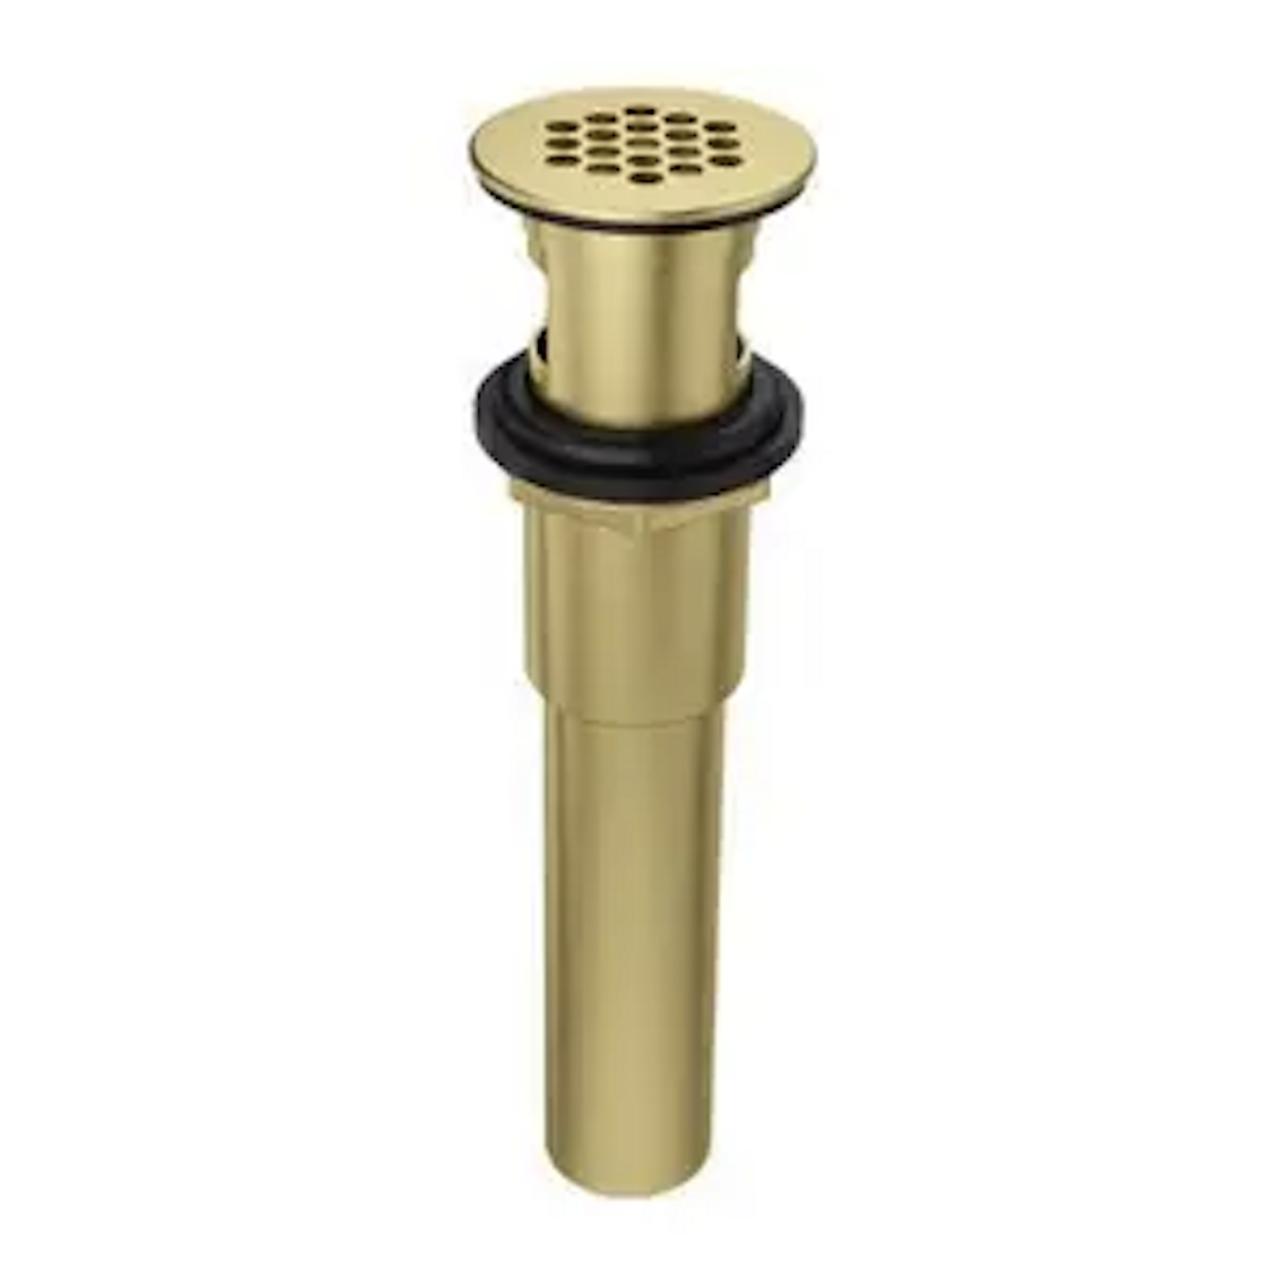 Pfister T479GSBG Bathroom Faucet Grid Strainer Brushed Gold Finish